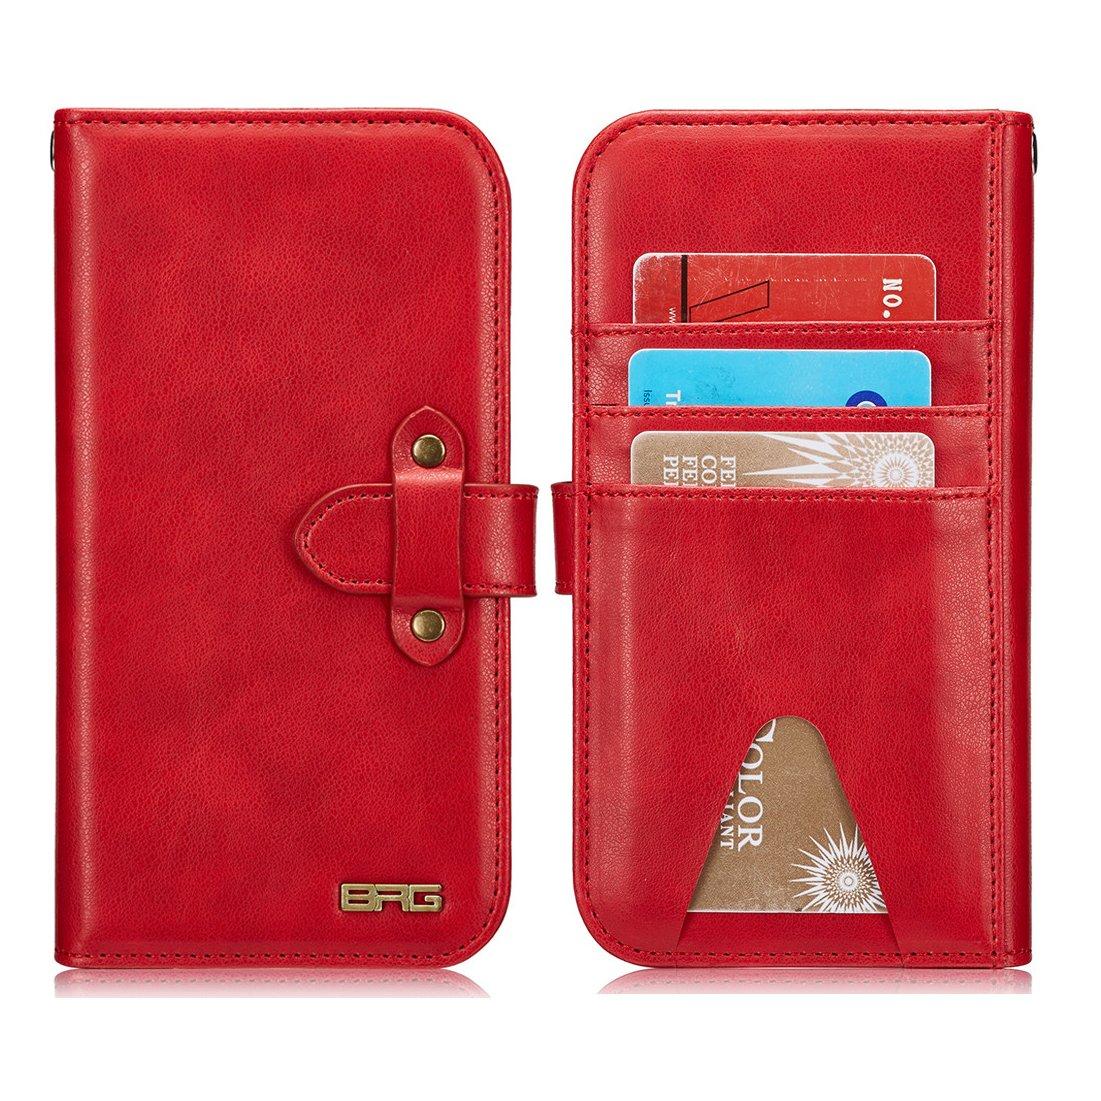 eee76a2efa Amazon | iphone7 Plusケース iphone8 Plusケース 手帳型 財布型 クラッチバッグ 【Boomshine】高品質 PUレザー  アイホン7/8プラス ケース 分離式 多機能スマホ手帳形 ...